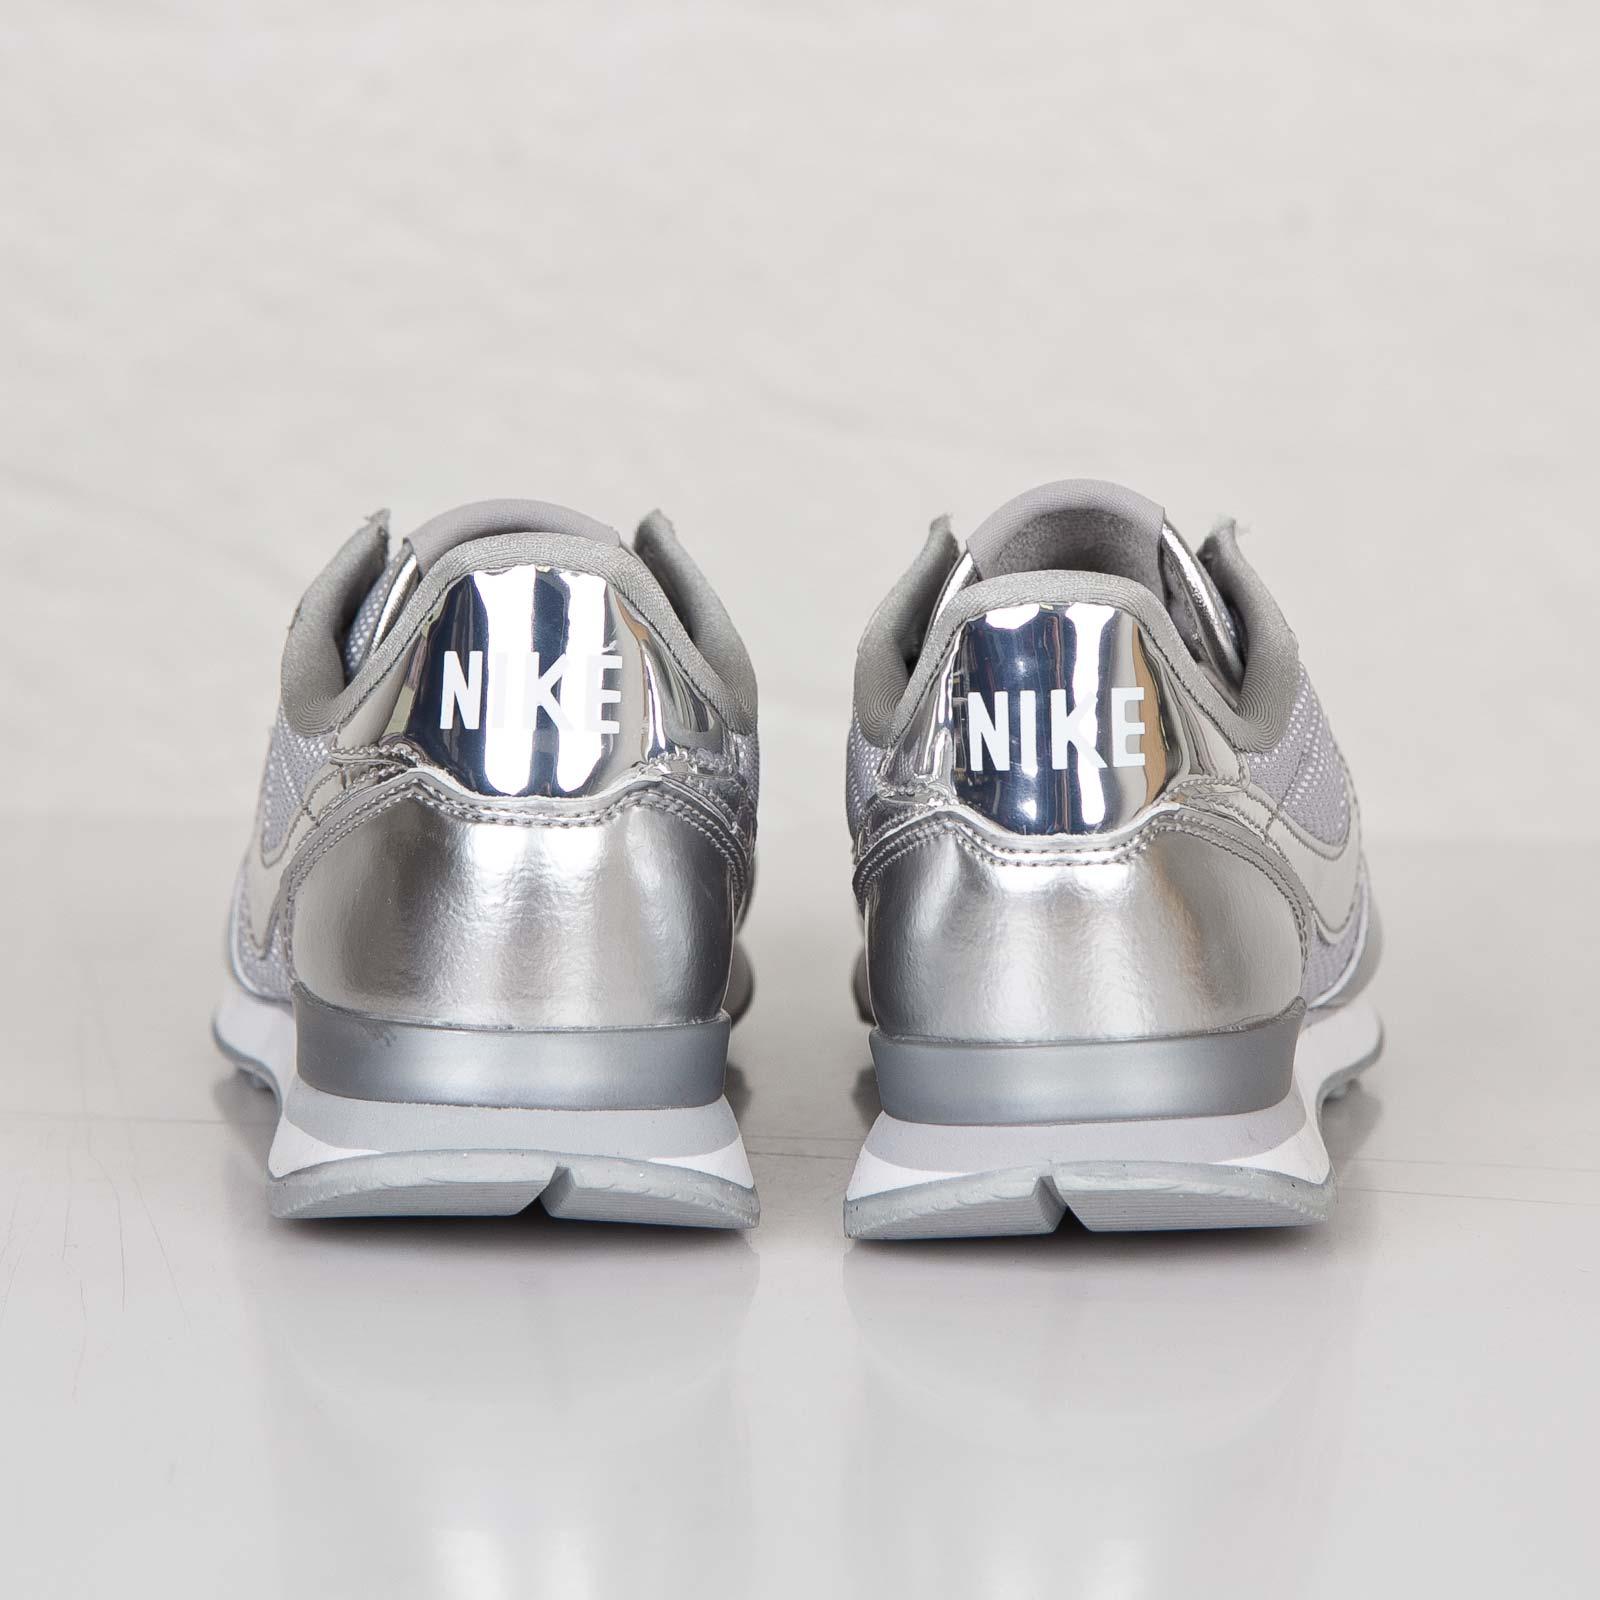 Nike WMNS Internationalist PRM 631756 001 Sneakersnstuff